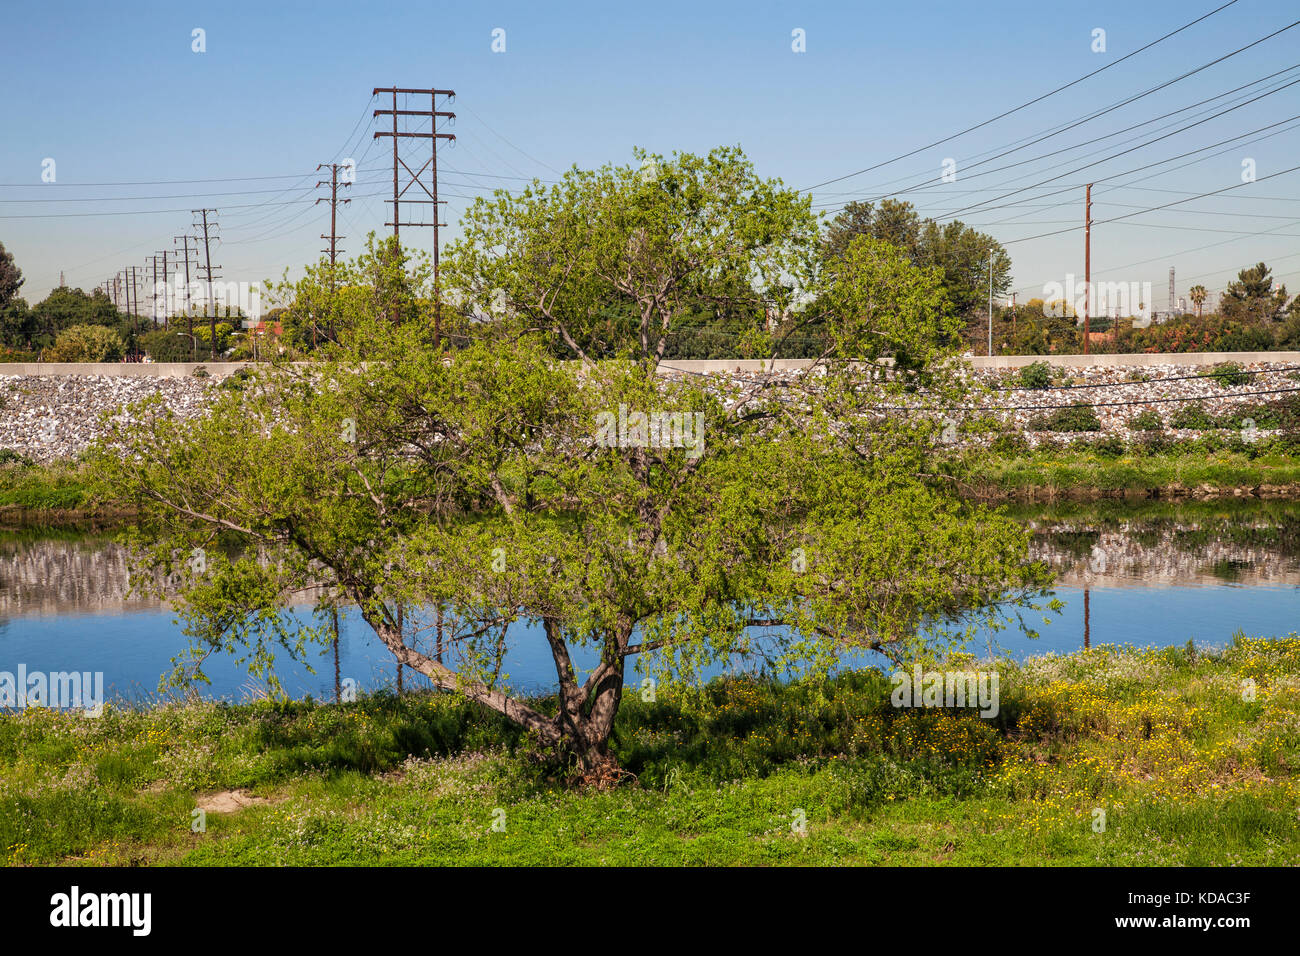 Los Angeles River near WIllow Street, Long Beach, California, USA Stock Photo